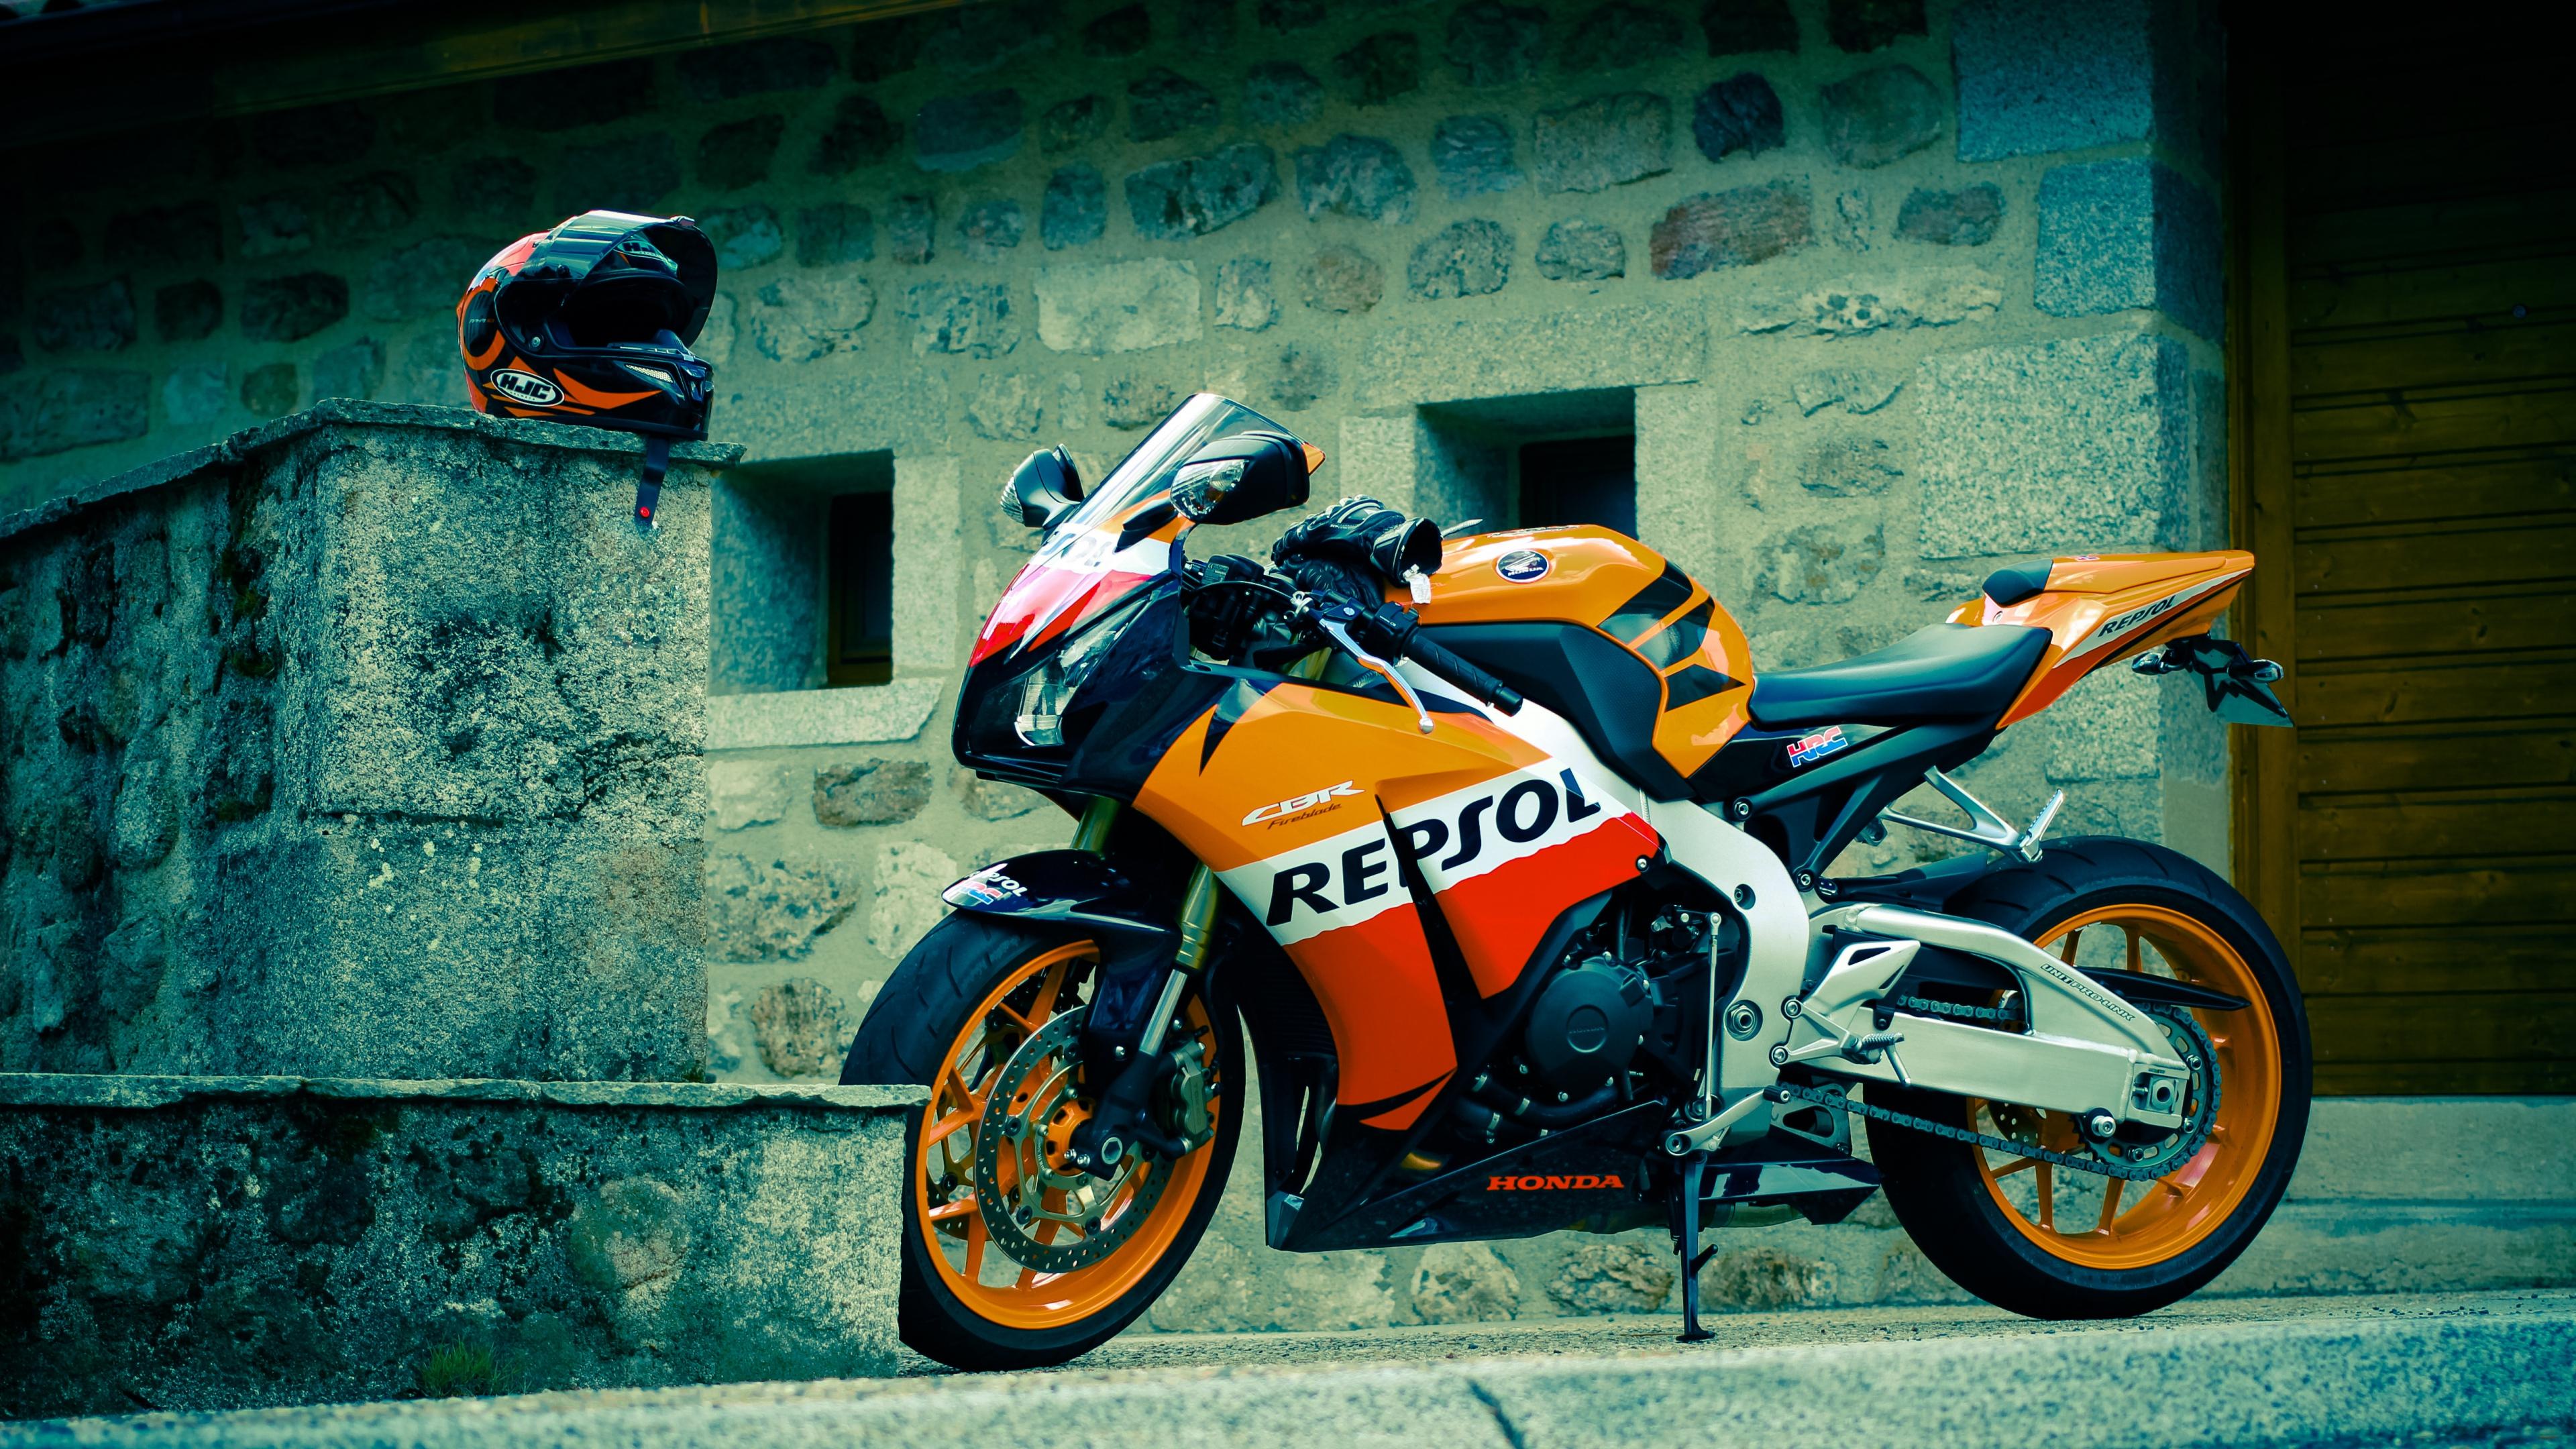 honda cbr repsol 4k 1536315966 - Honda Cbr Repsol 4k - repsol wallpapers, honda wallpapers, honda cbr wallpapers, bikes wallpapers